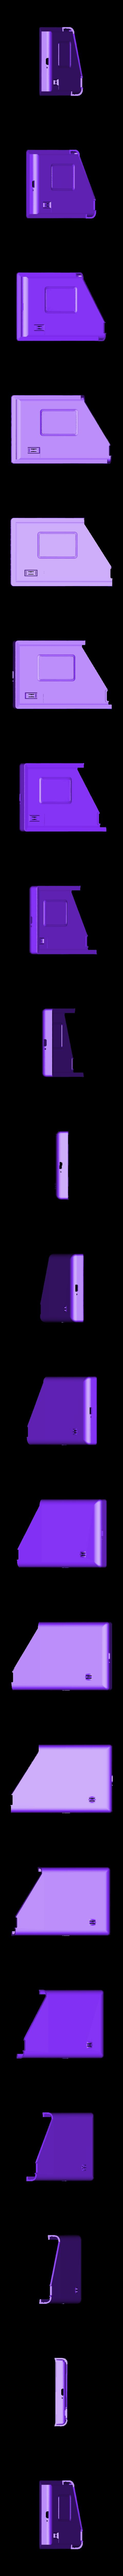 cova103_bottom.stl Download free STL file Fairphone 2 cover • 3D printer model, unwohlpol